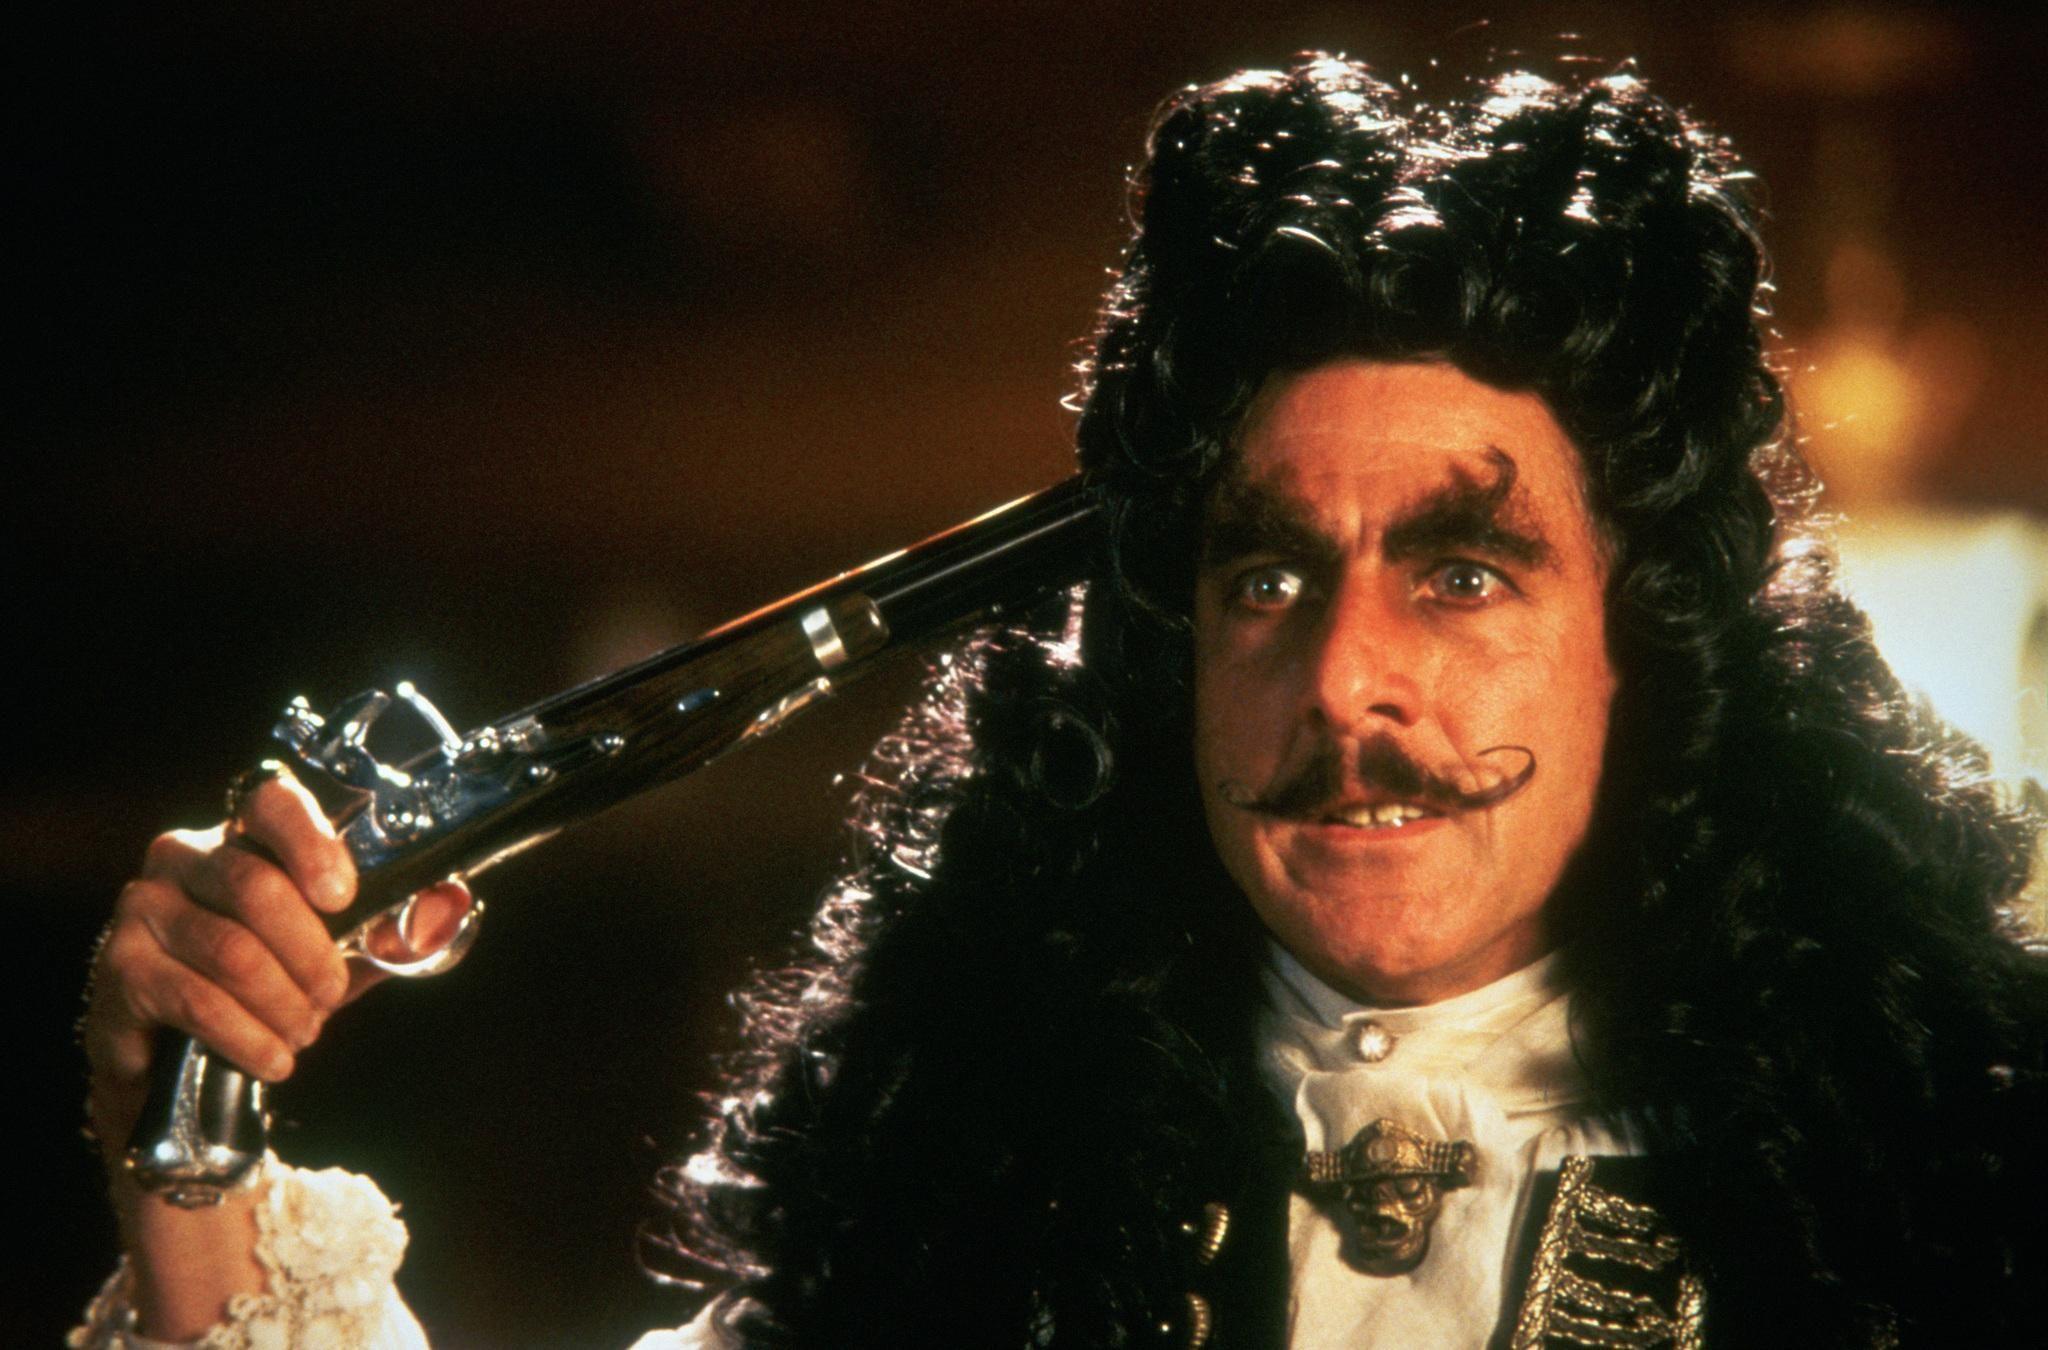 Dustin Hoffman as Captain Hook in Hook (1991). If you